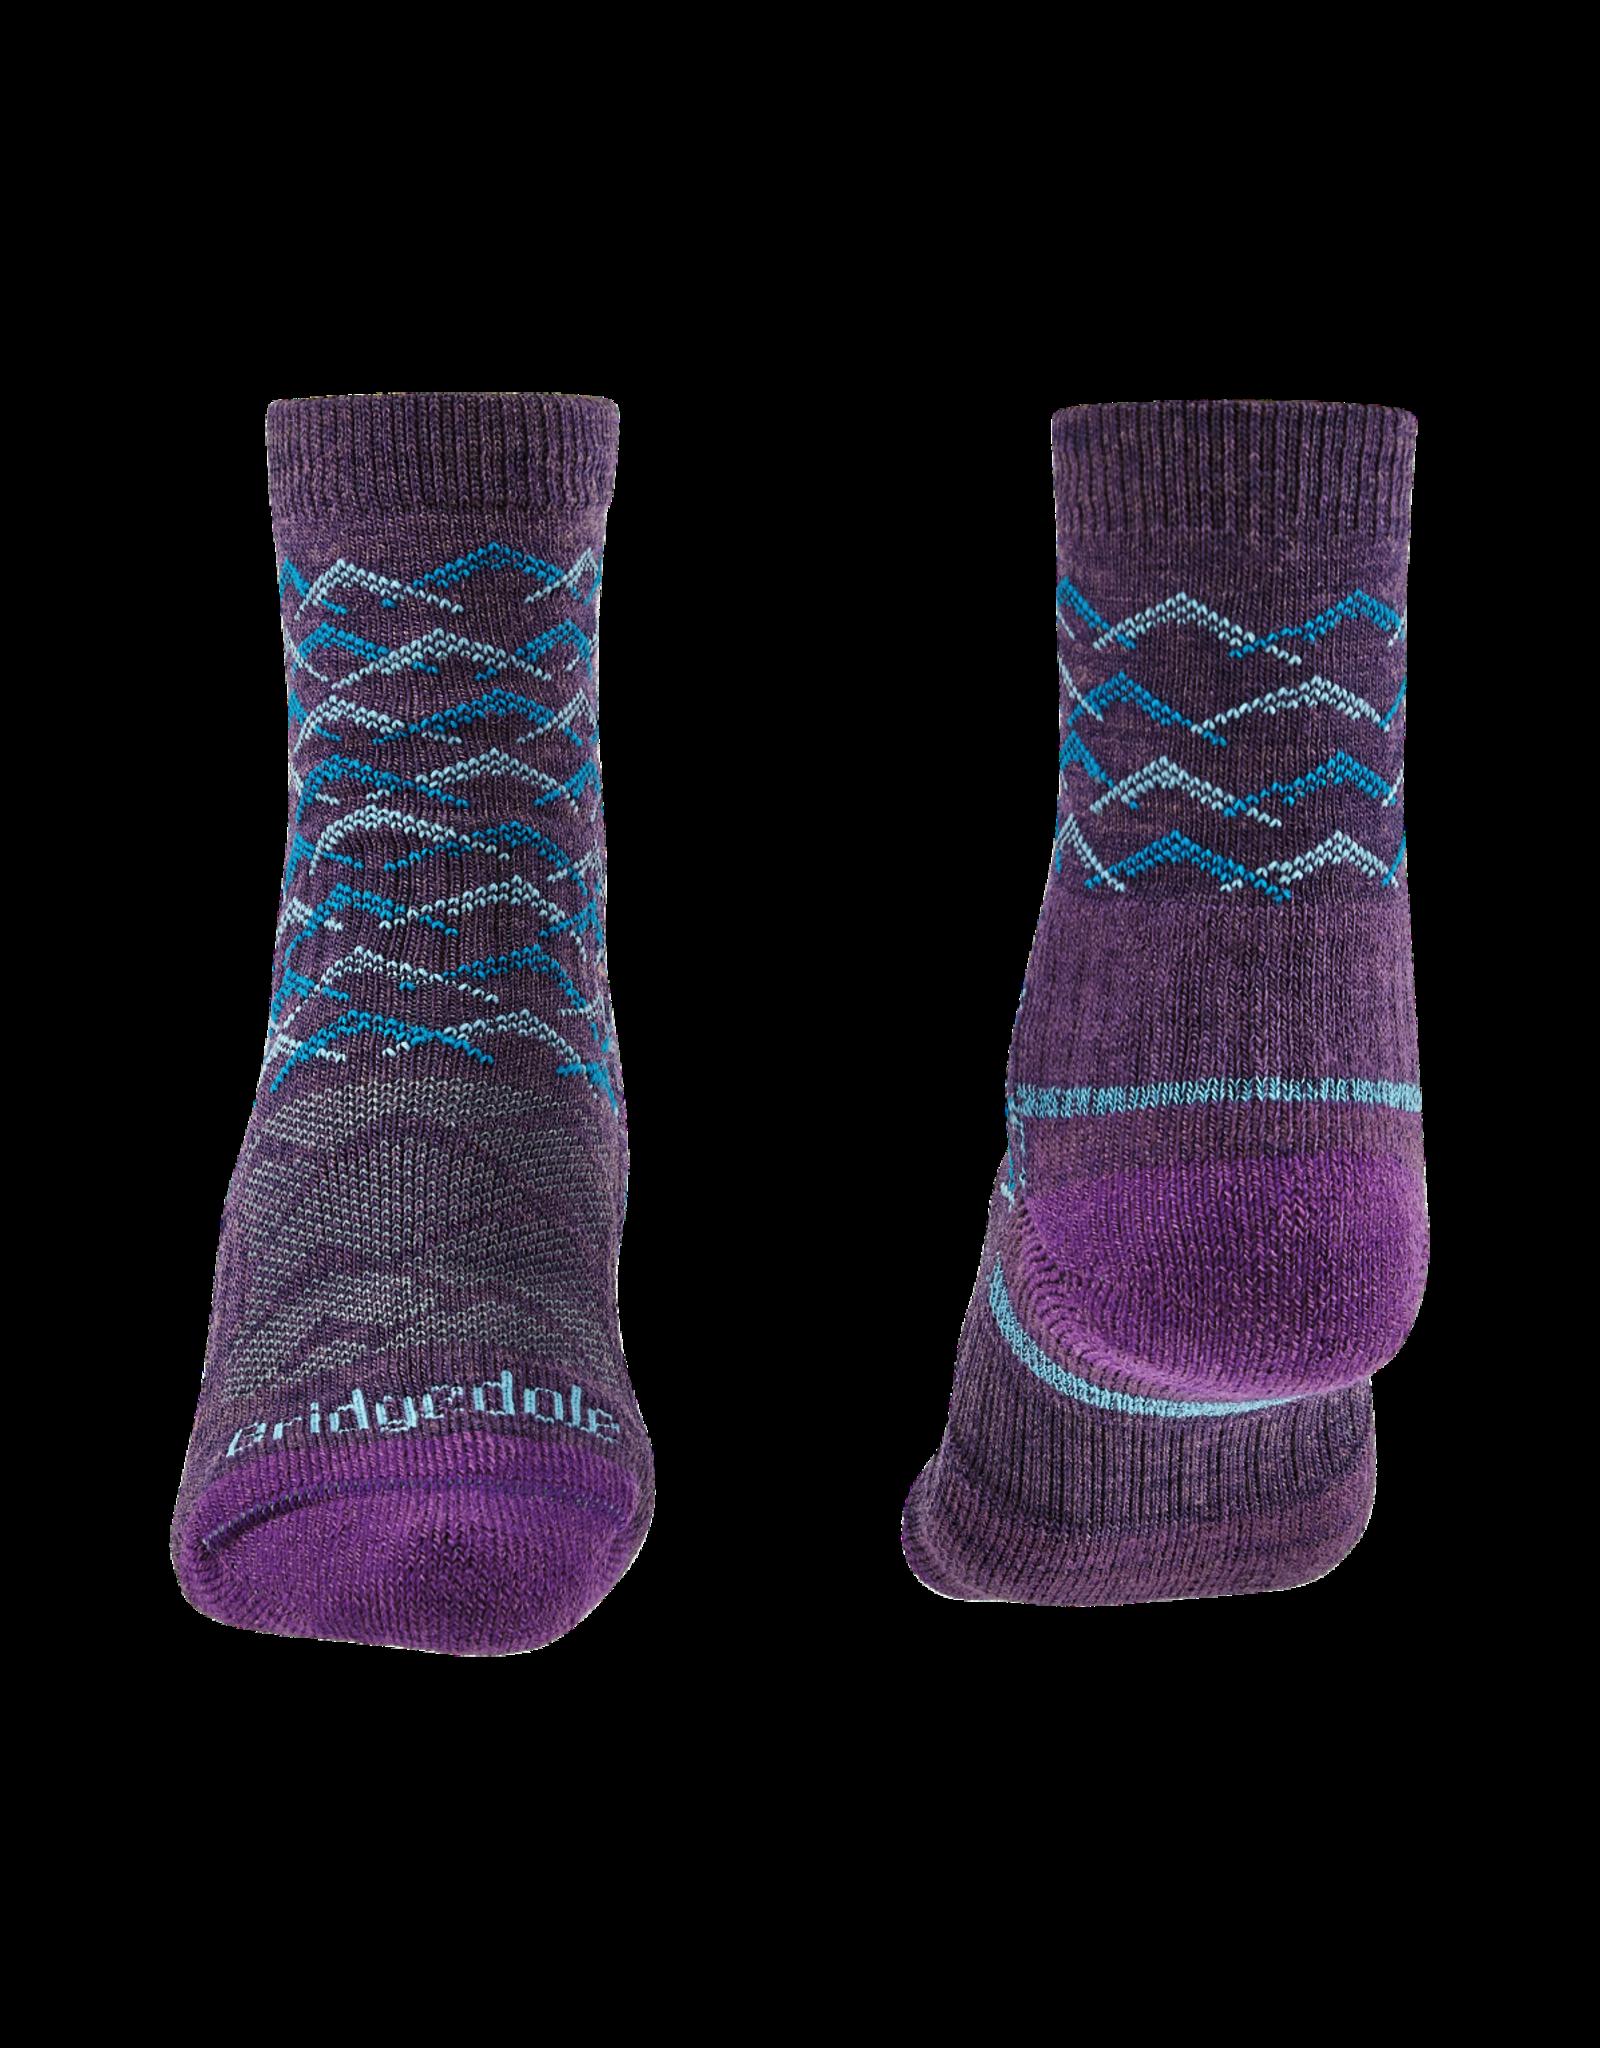 BRIDGEDALE Bridgedale Women's Lightweight Merino Endurance Hiking Socks 3/4 Crew Height